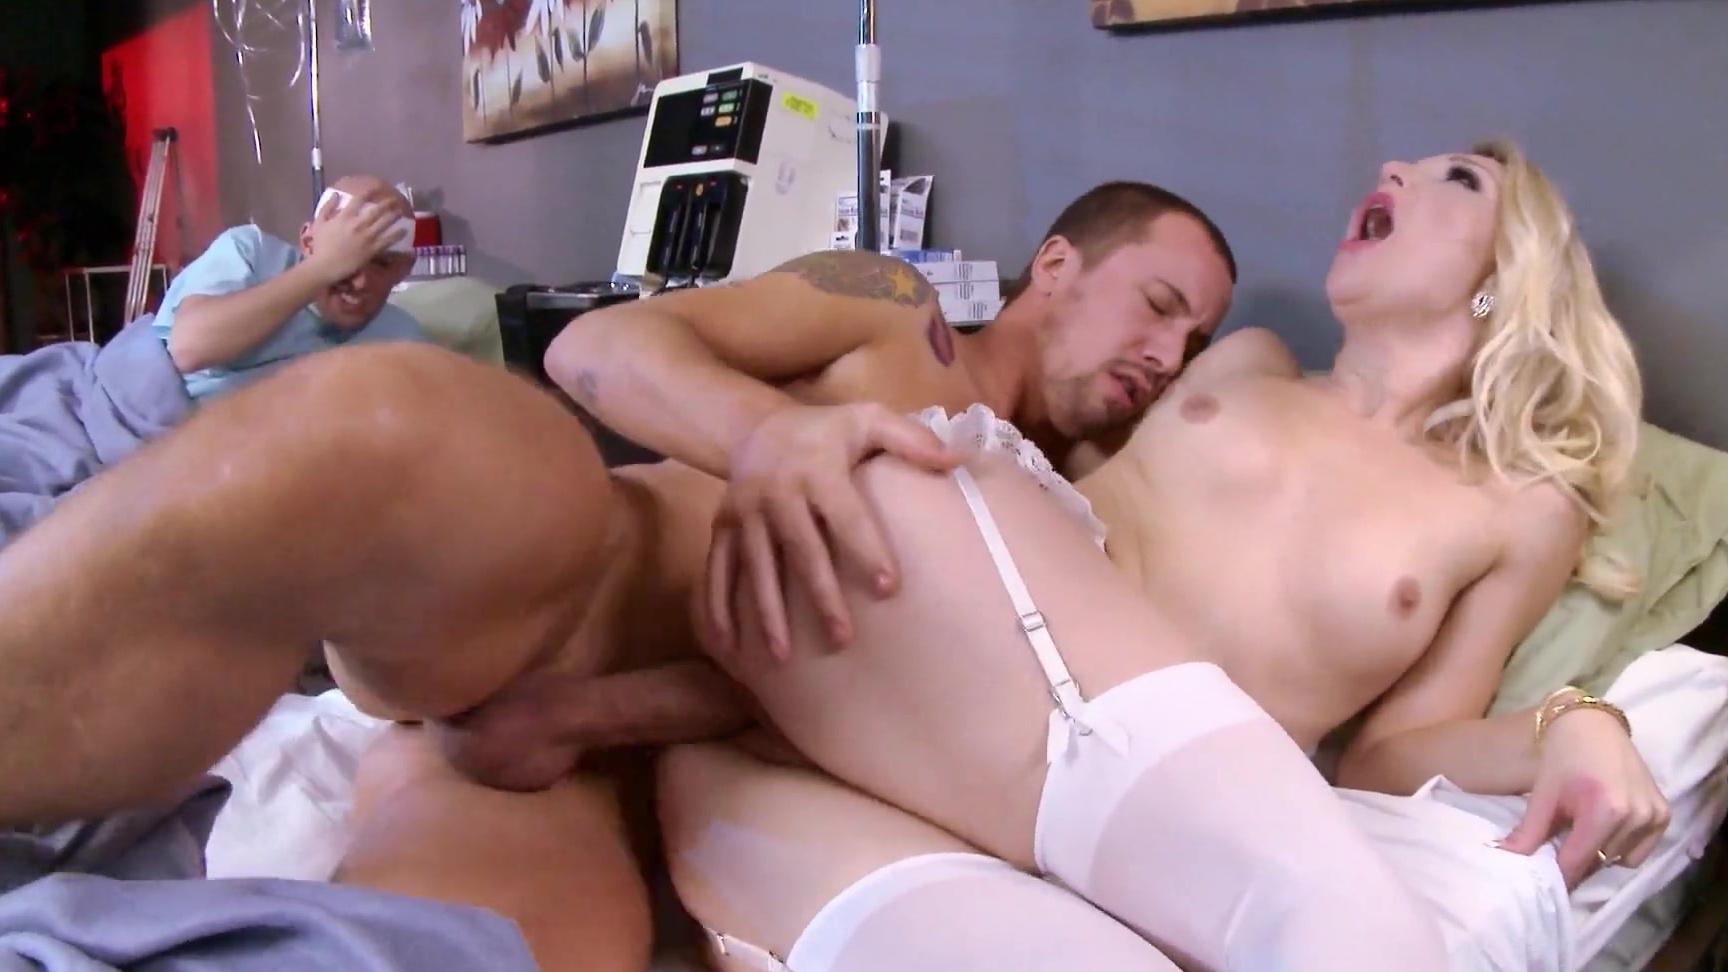 Playgirl opens up her legs for men penetration